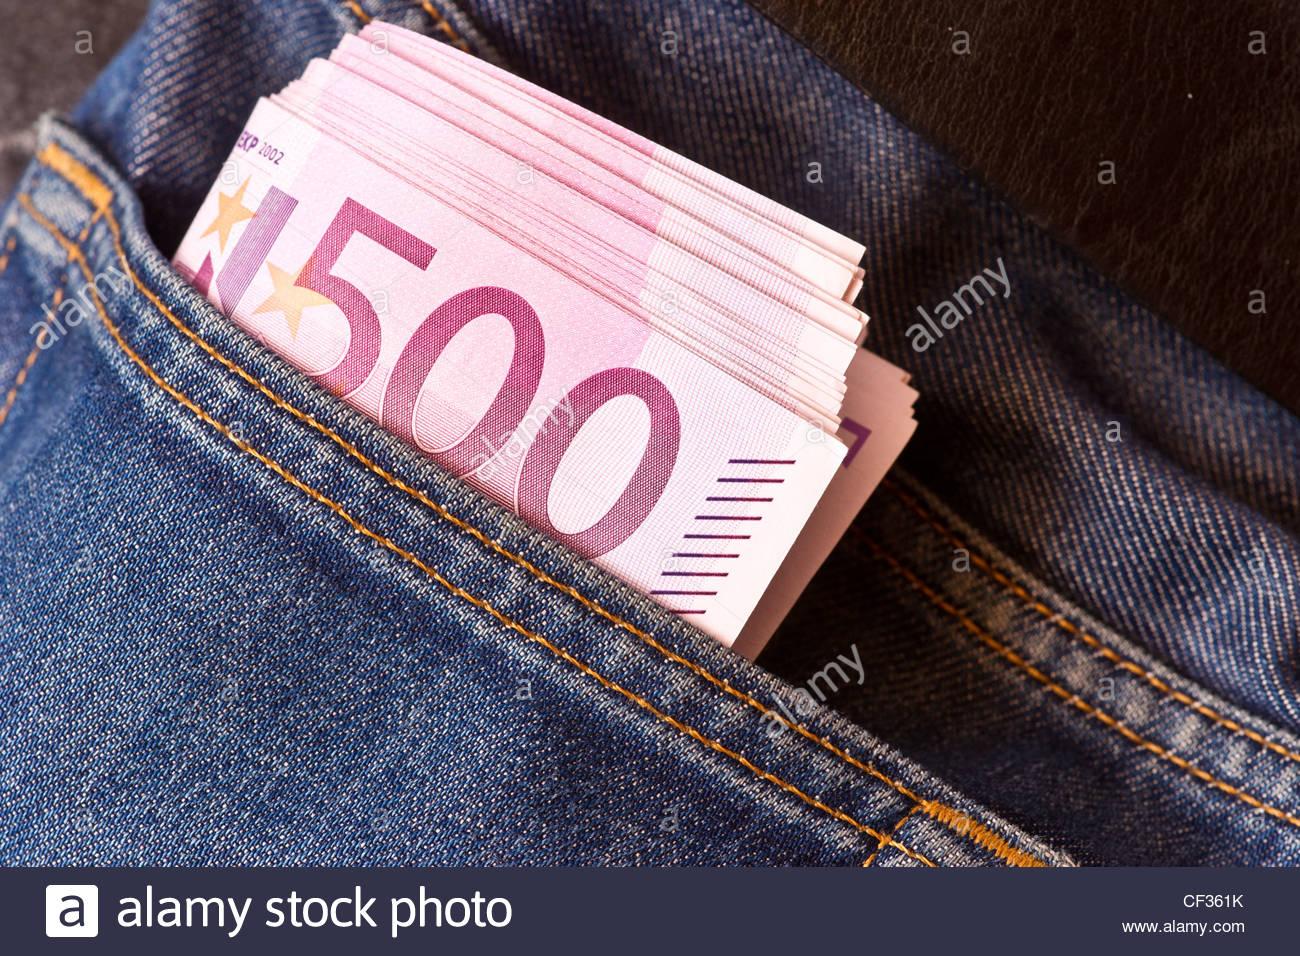 We buy euros